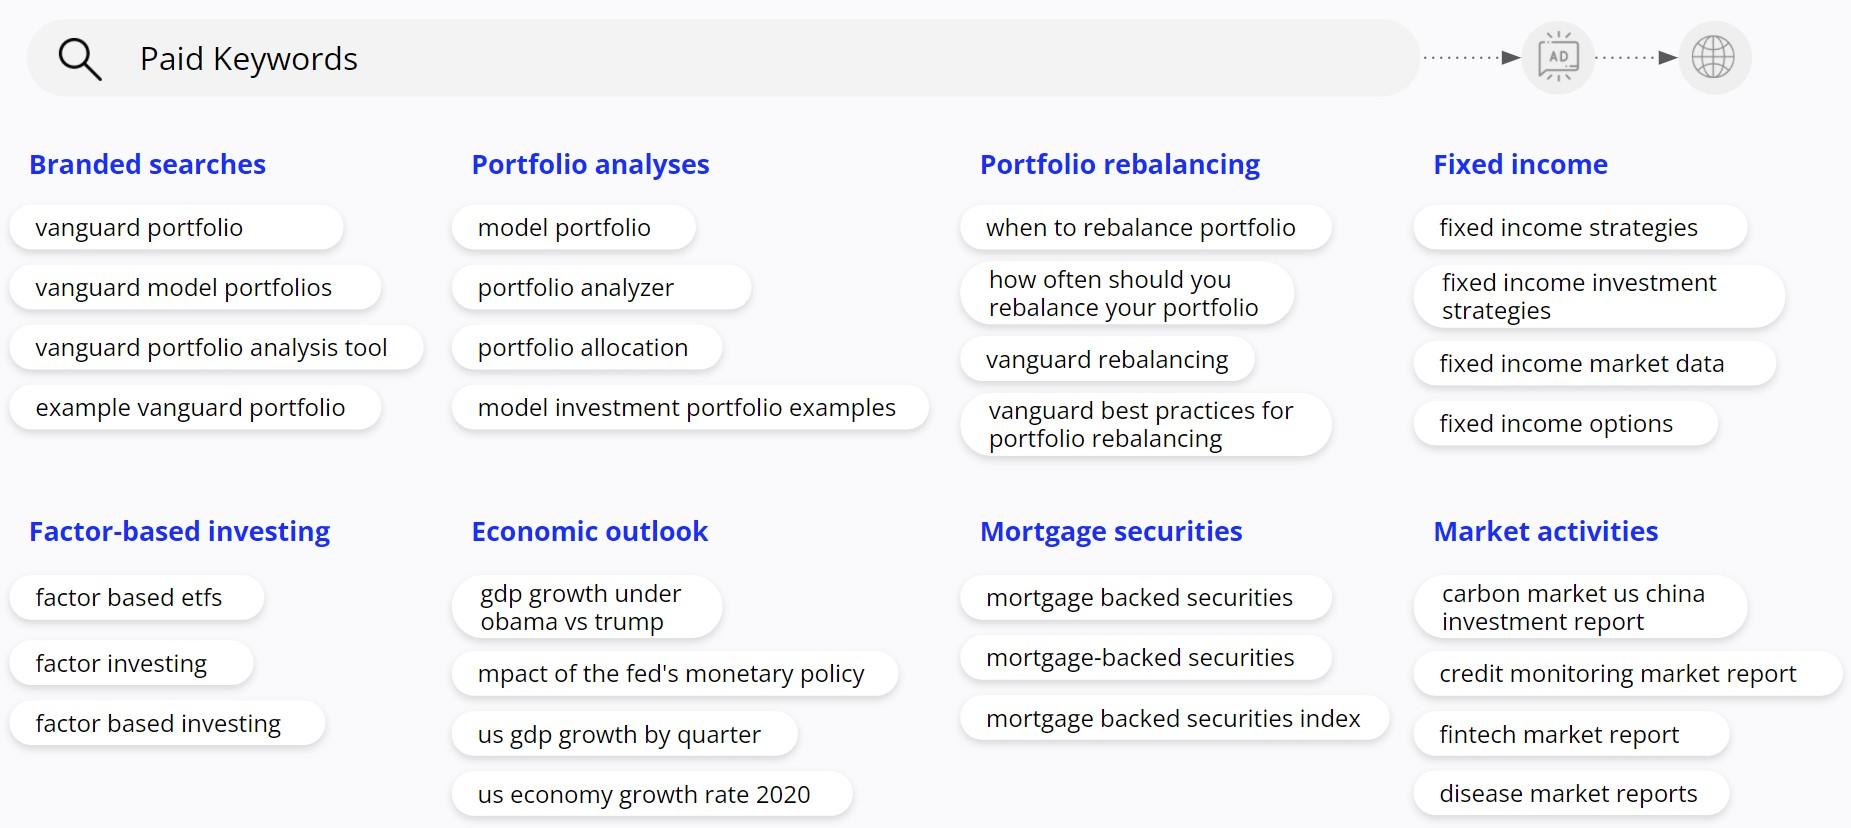 Vanguard - Top Paid Keywords